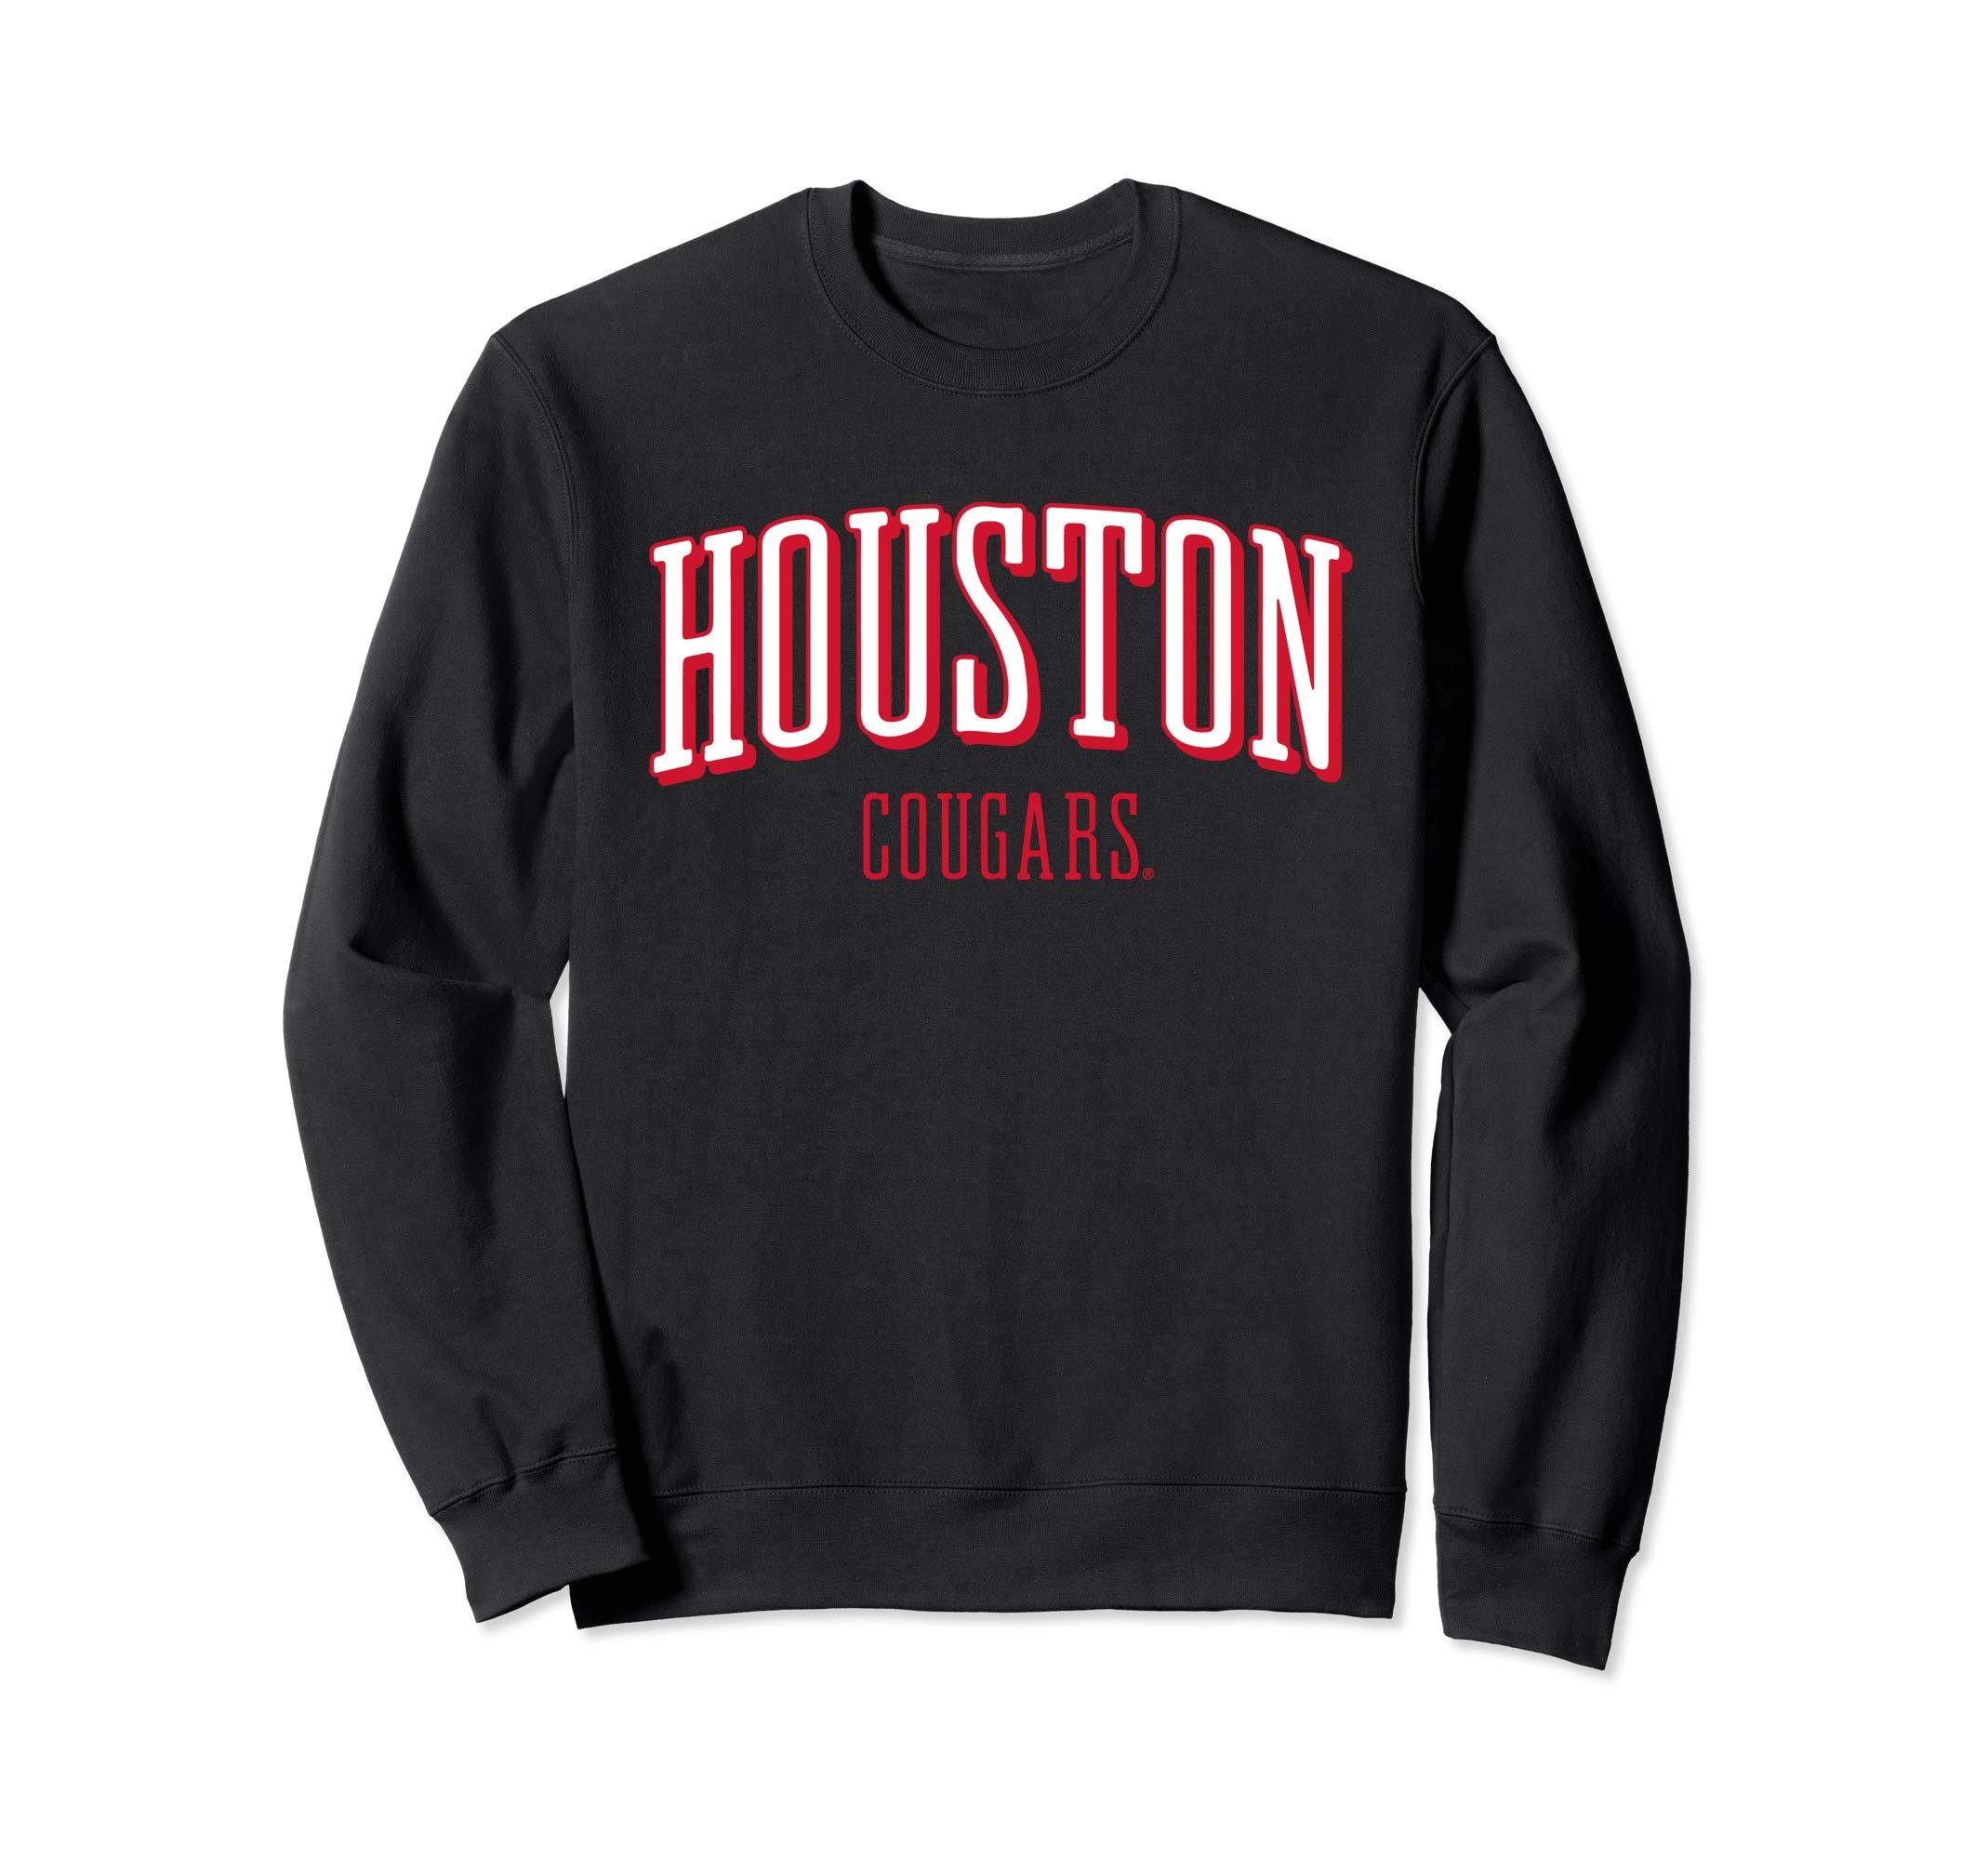 Men University College A/&M UH Youth Texas Represent Long Sleeve T-shirt LS